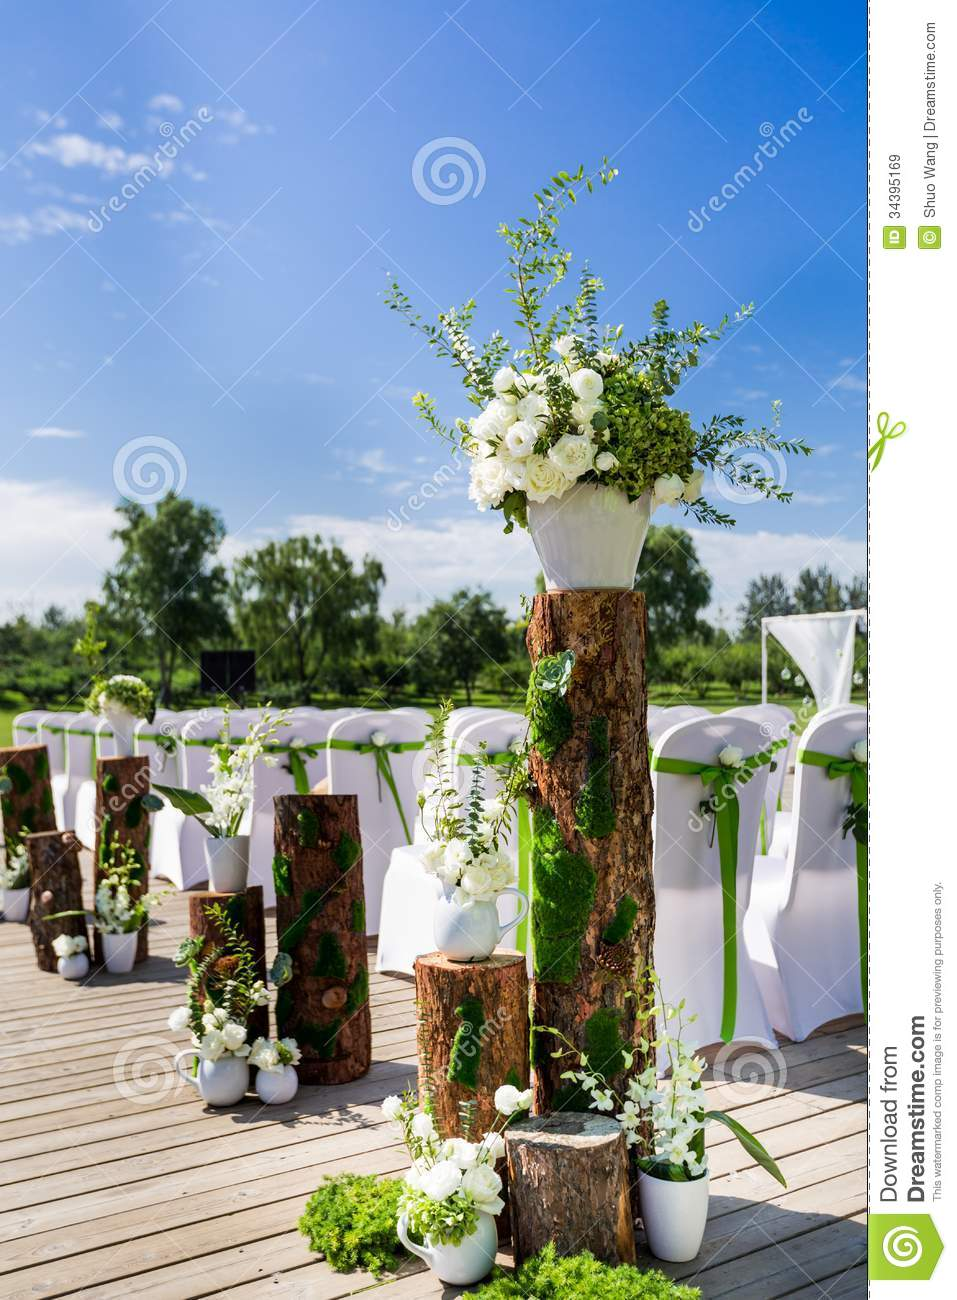 wedding chair flowers photo - 1